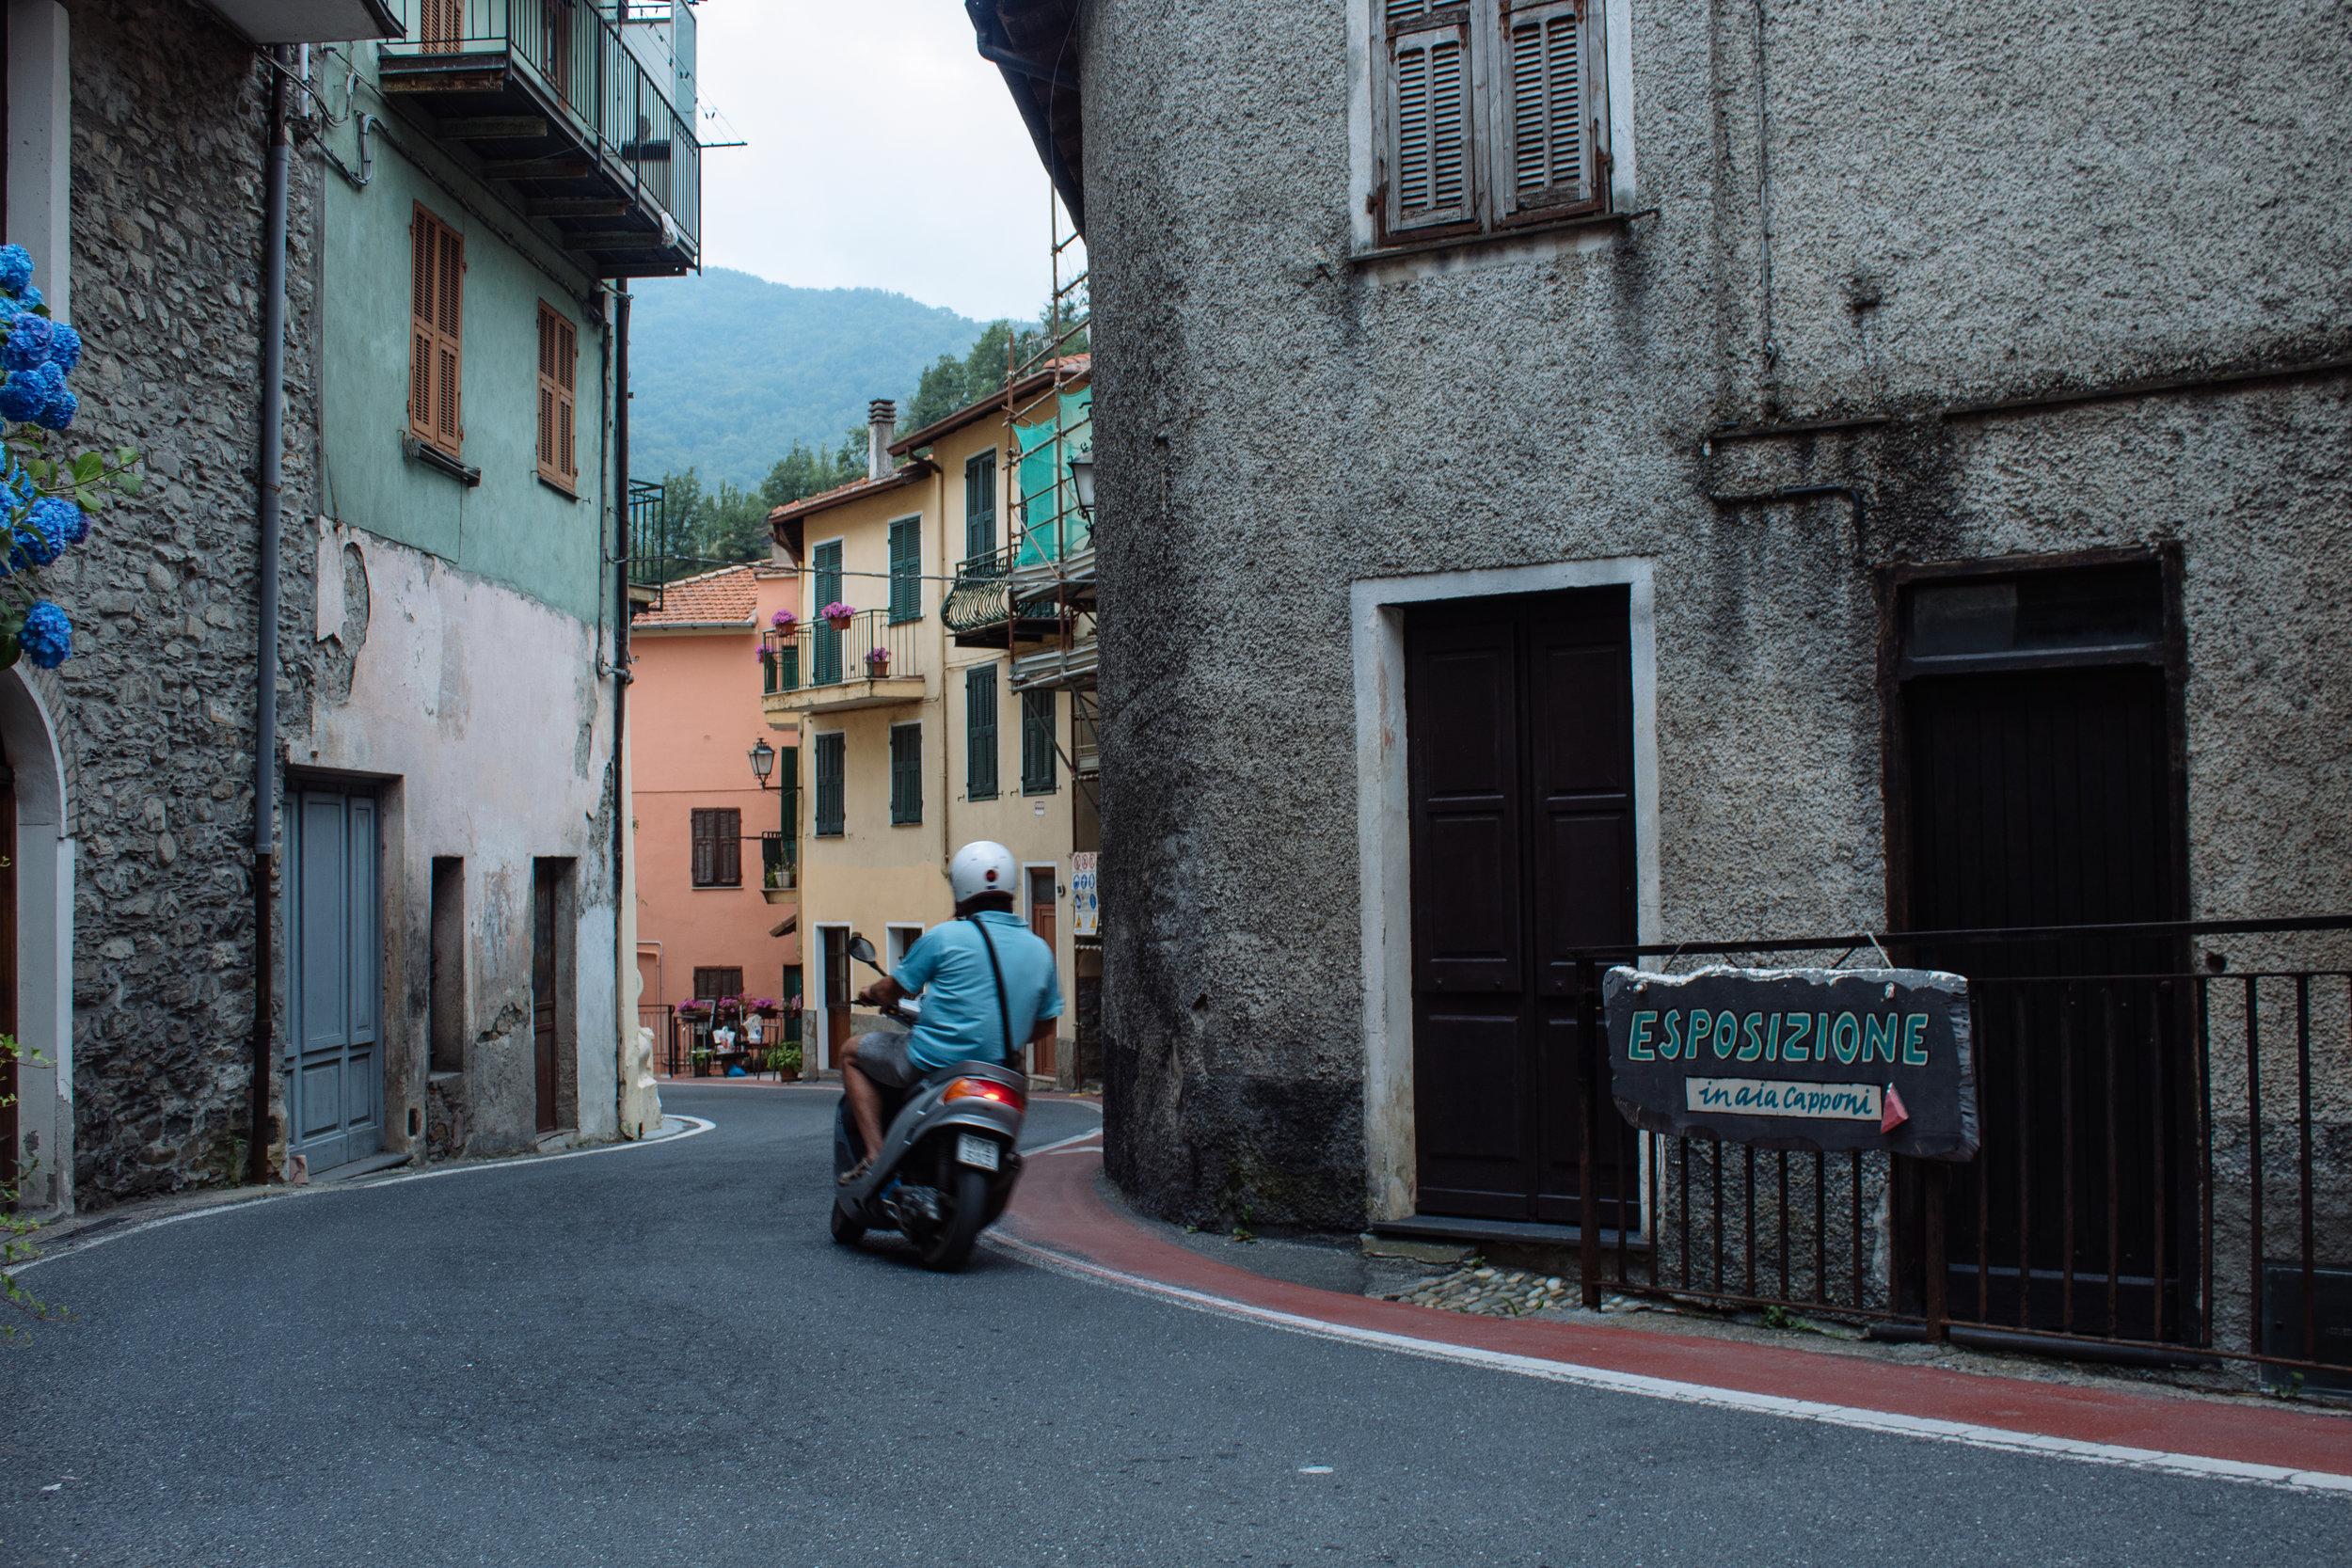 Quintessential Italian streets